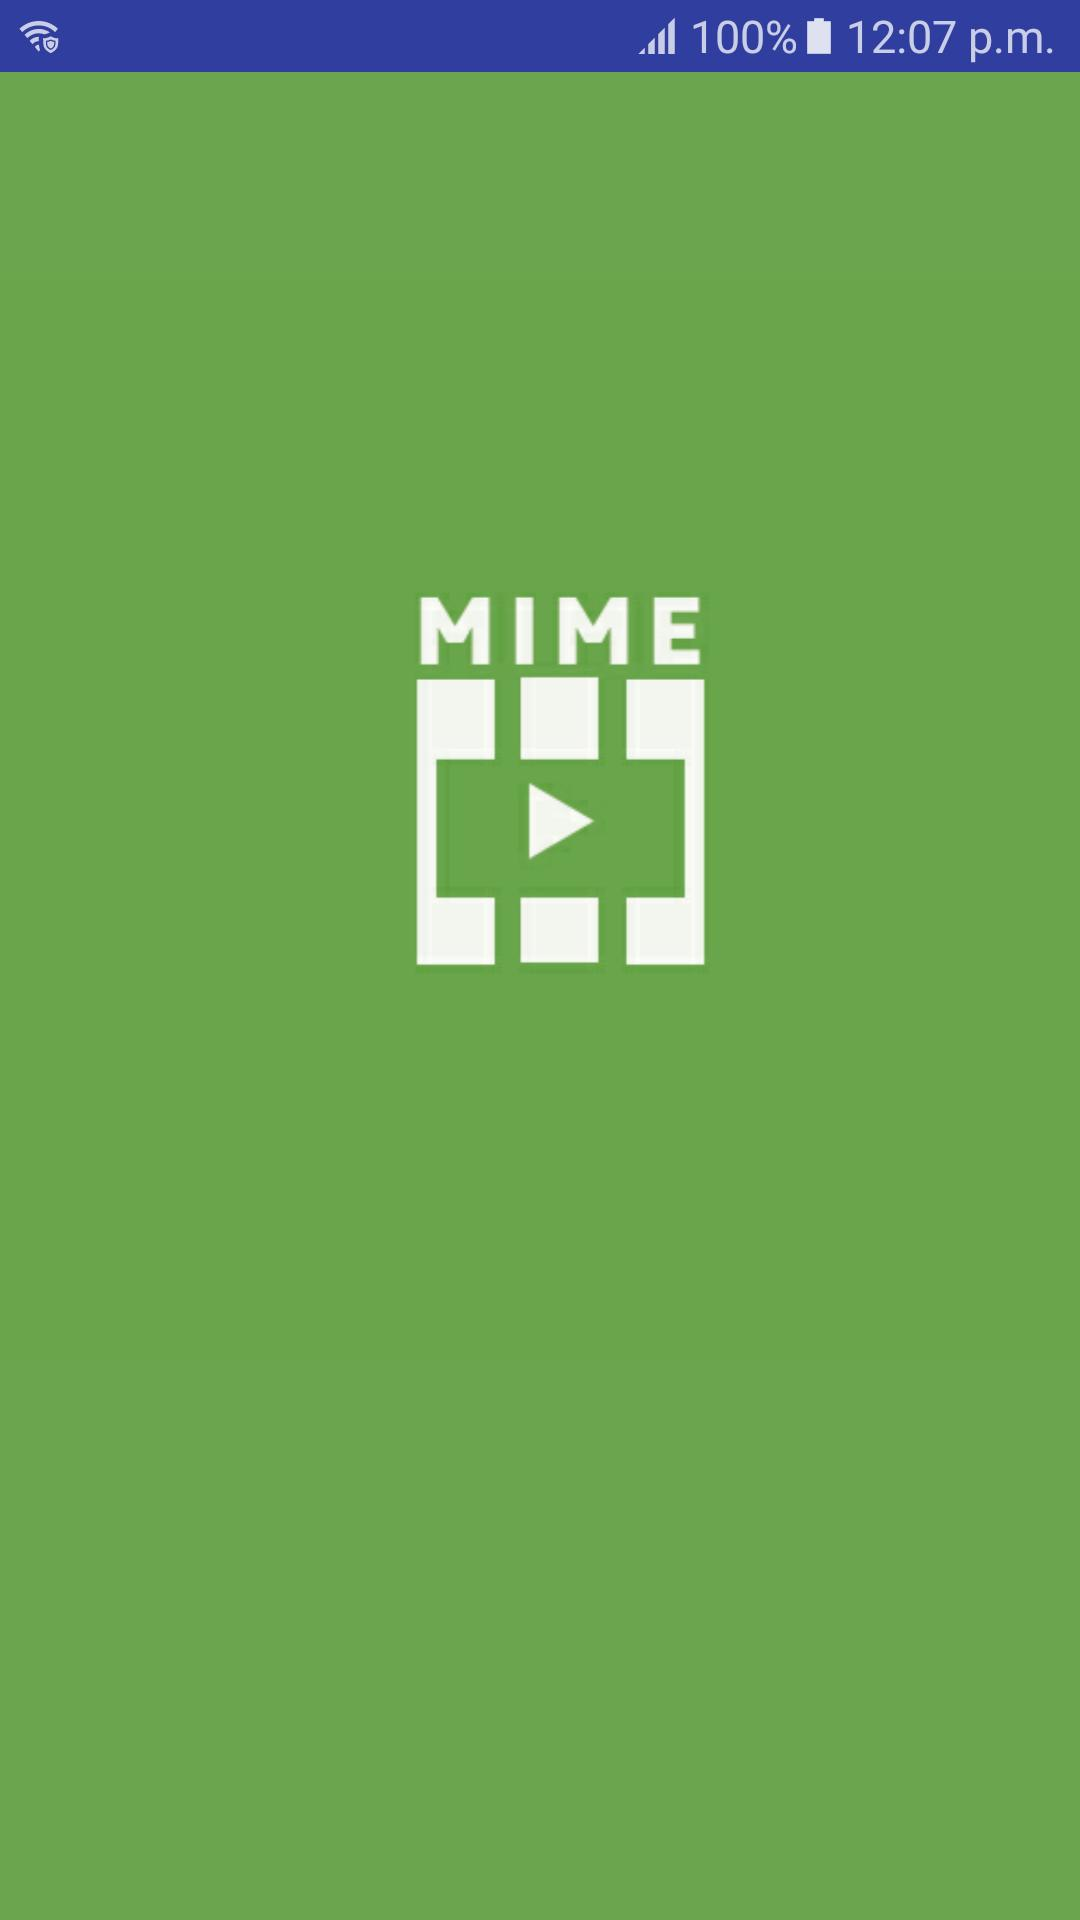 Microsoft s mime download